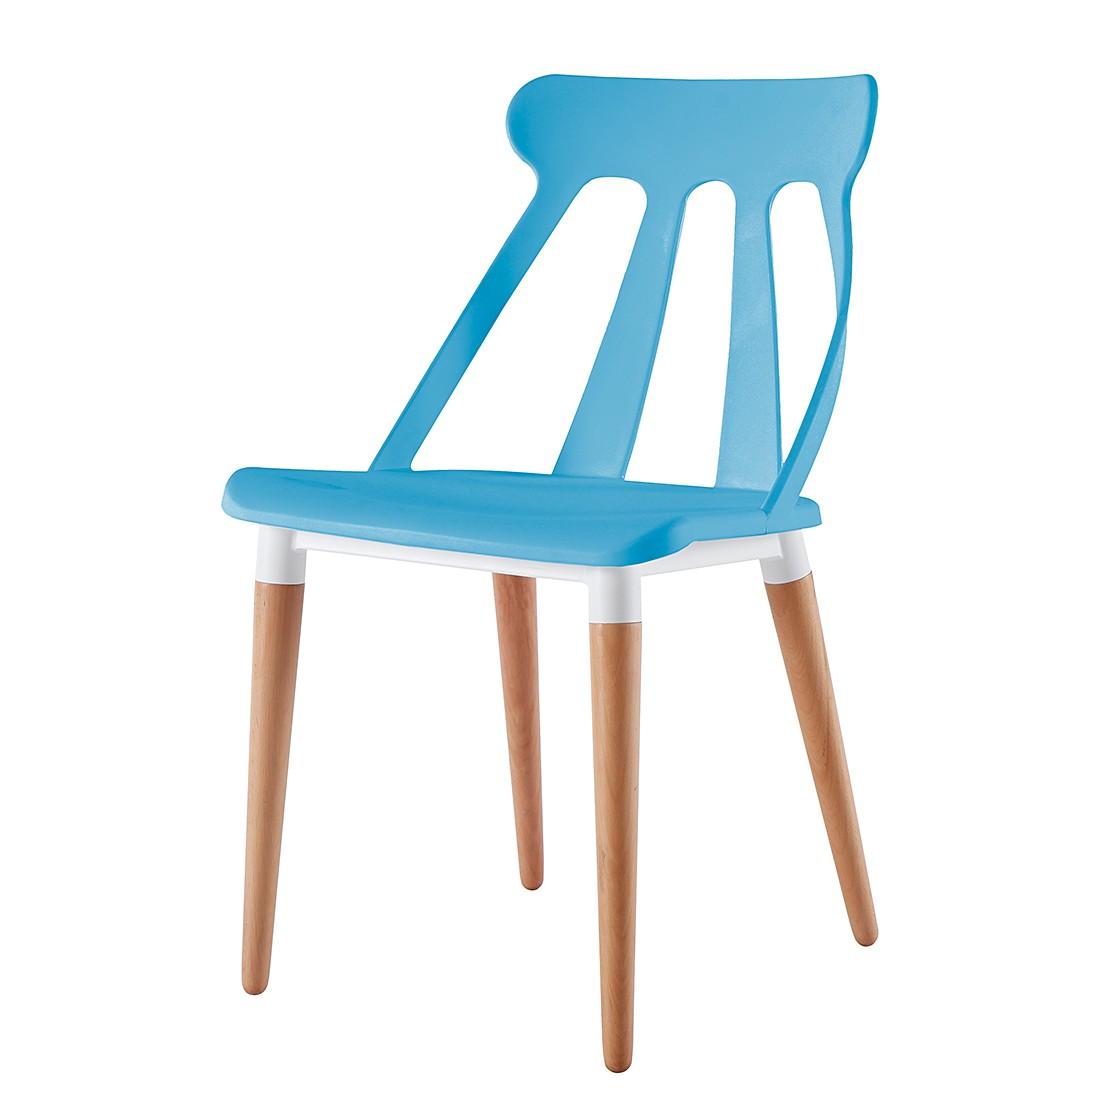 Esszimmerstuhl Acade (2er-Set) – Blau, Mørteens jetzt bestellen